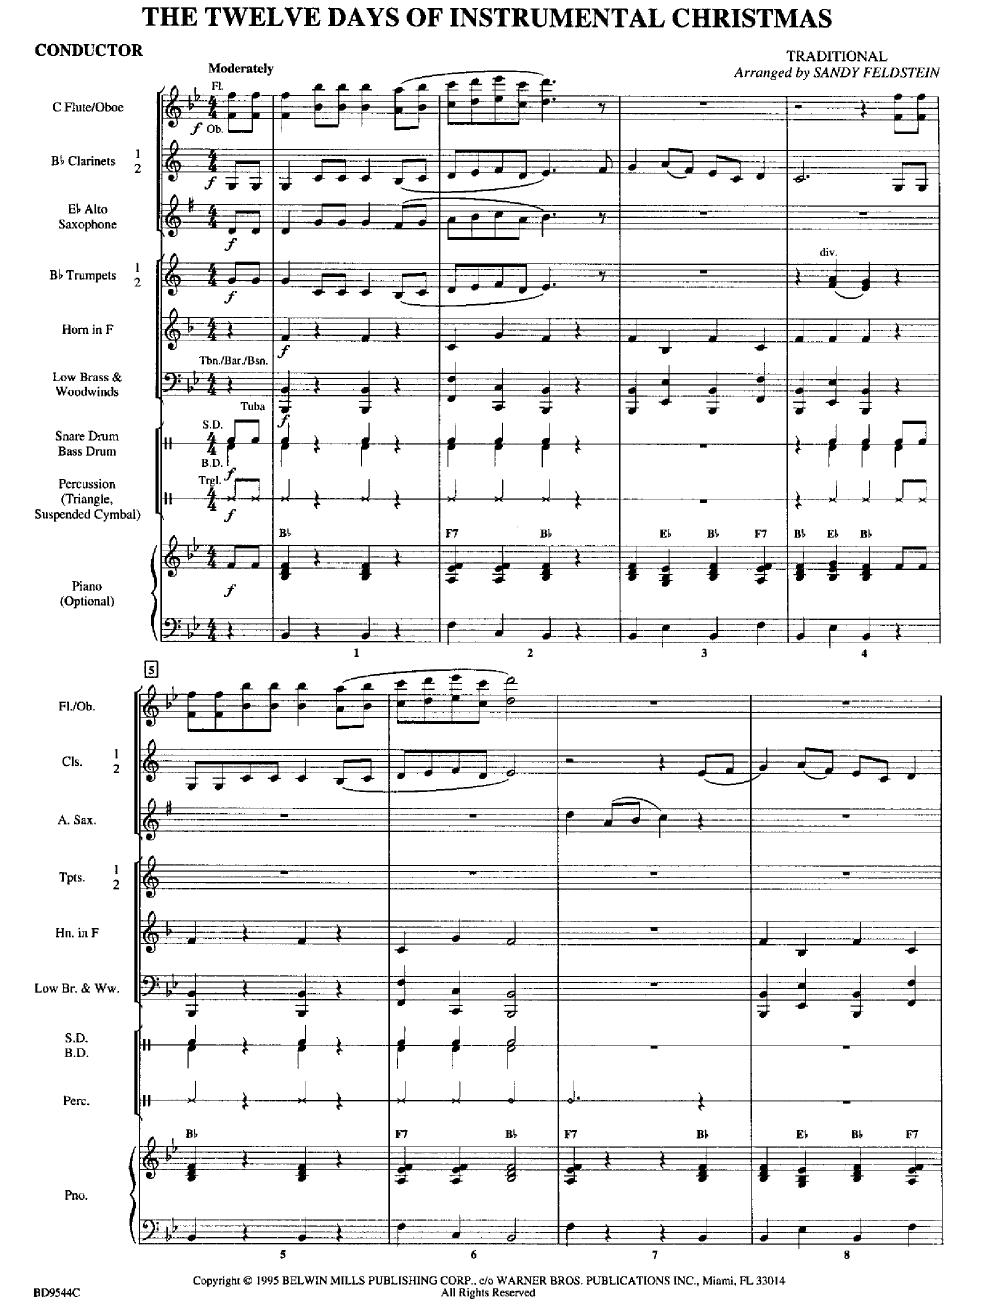 The Twelve Days of Instrumental Christmas arr. Sa | J.W. Pepper ...